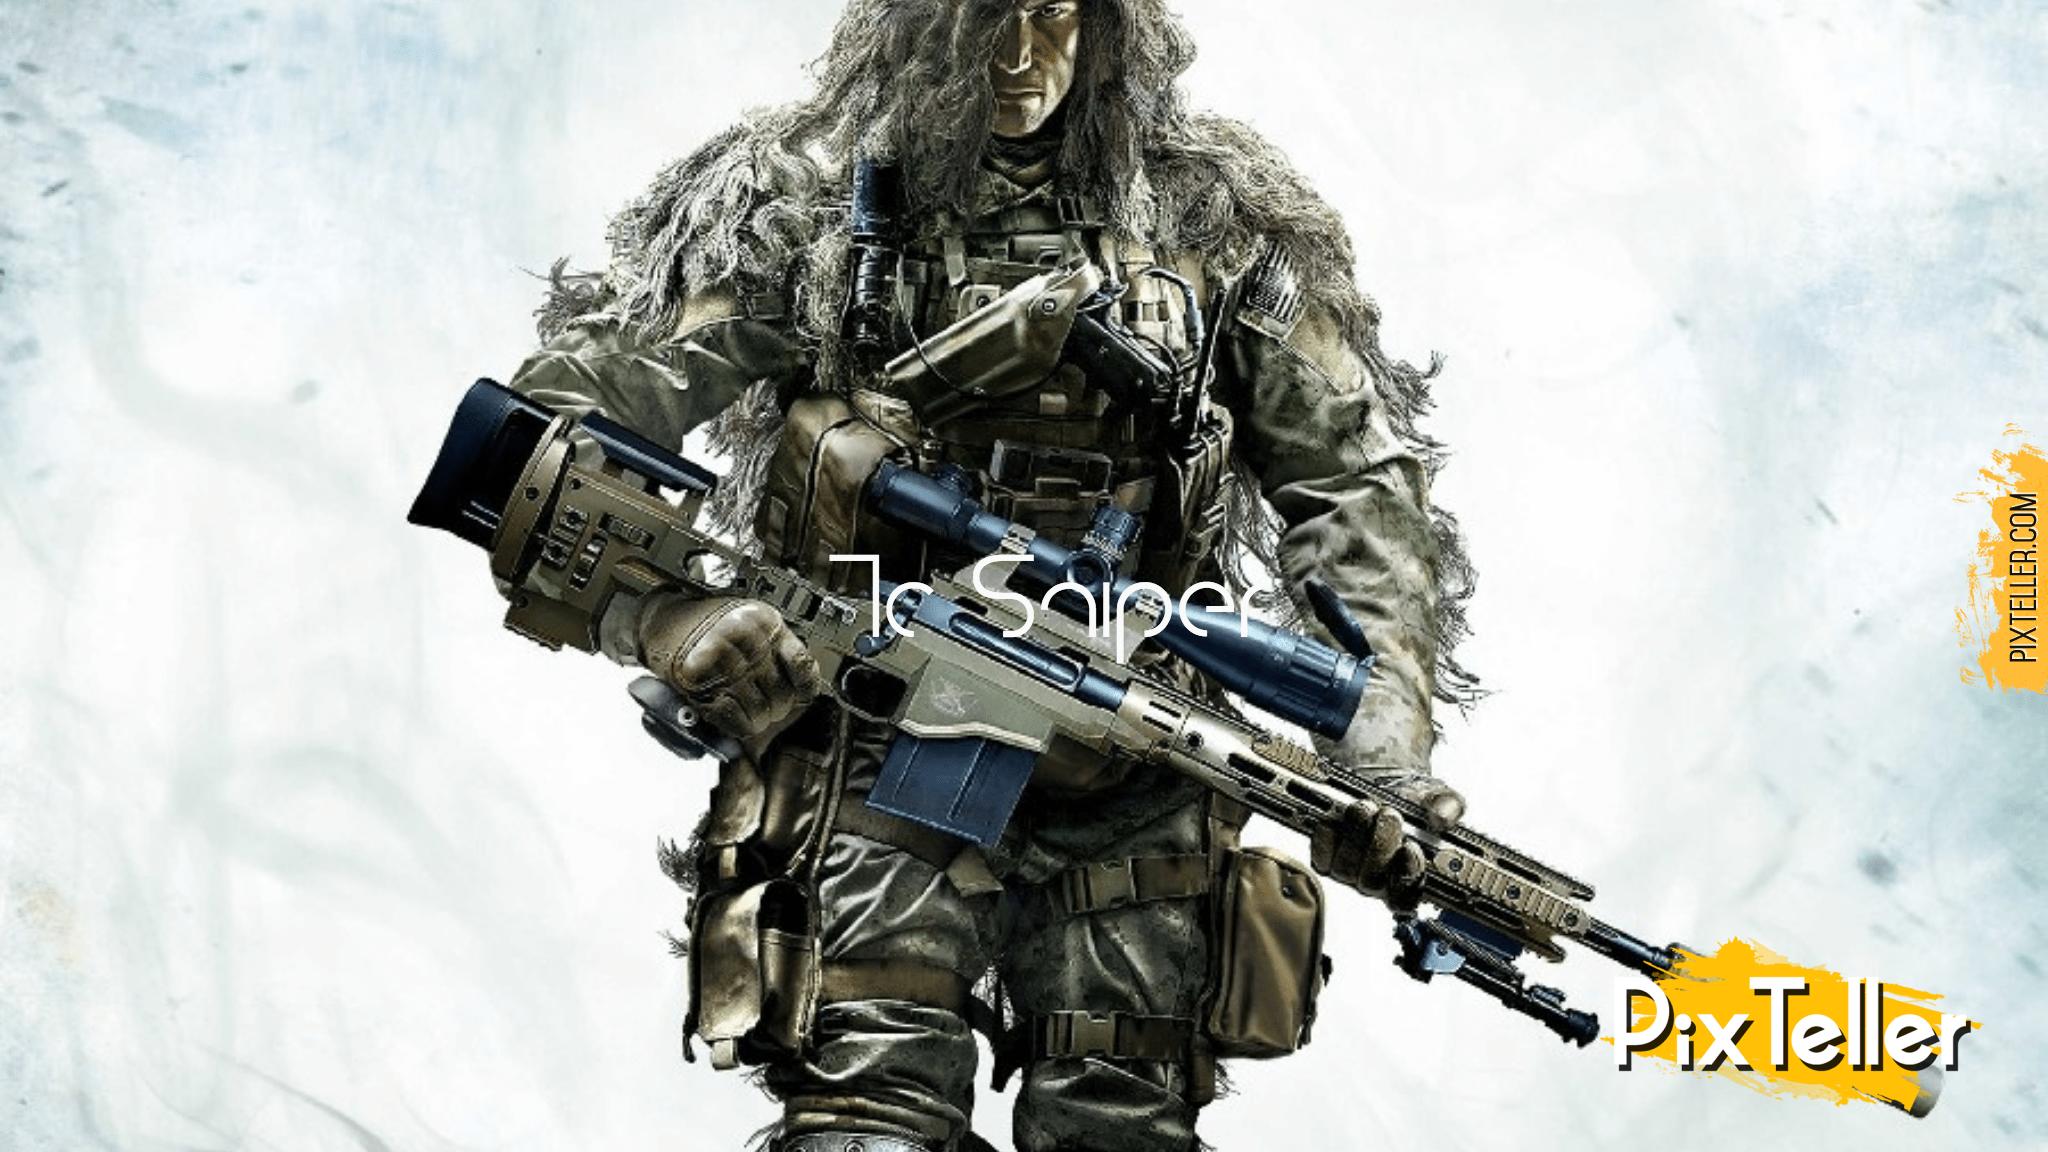 Soldier,                Mercenary,                Military,                Weapon,                Marksman,                Army,                Reconnaissance,                Militia,                Organization,                Profession,                White,                Black,                 Free Image